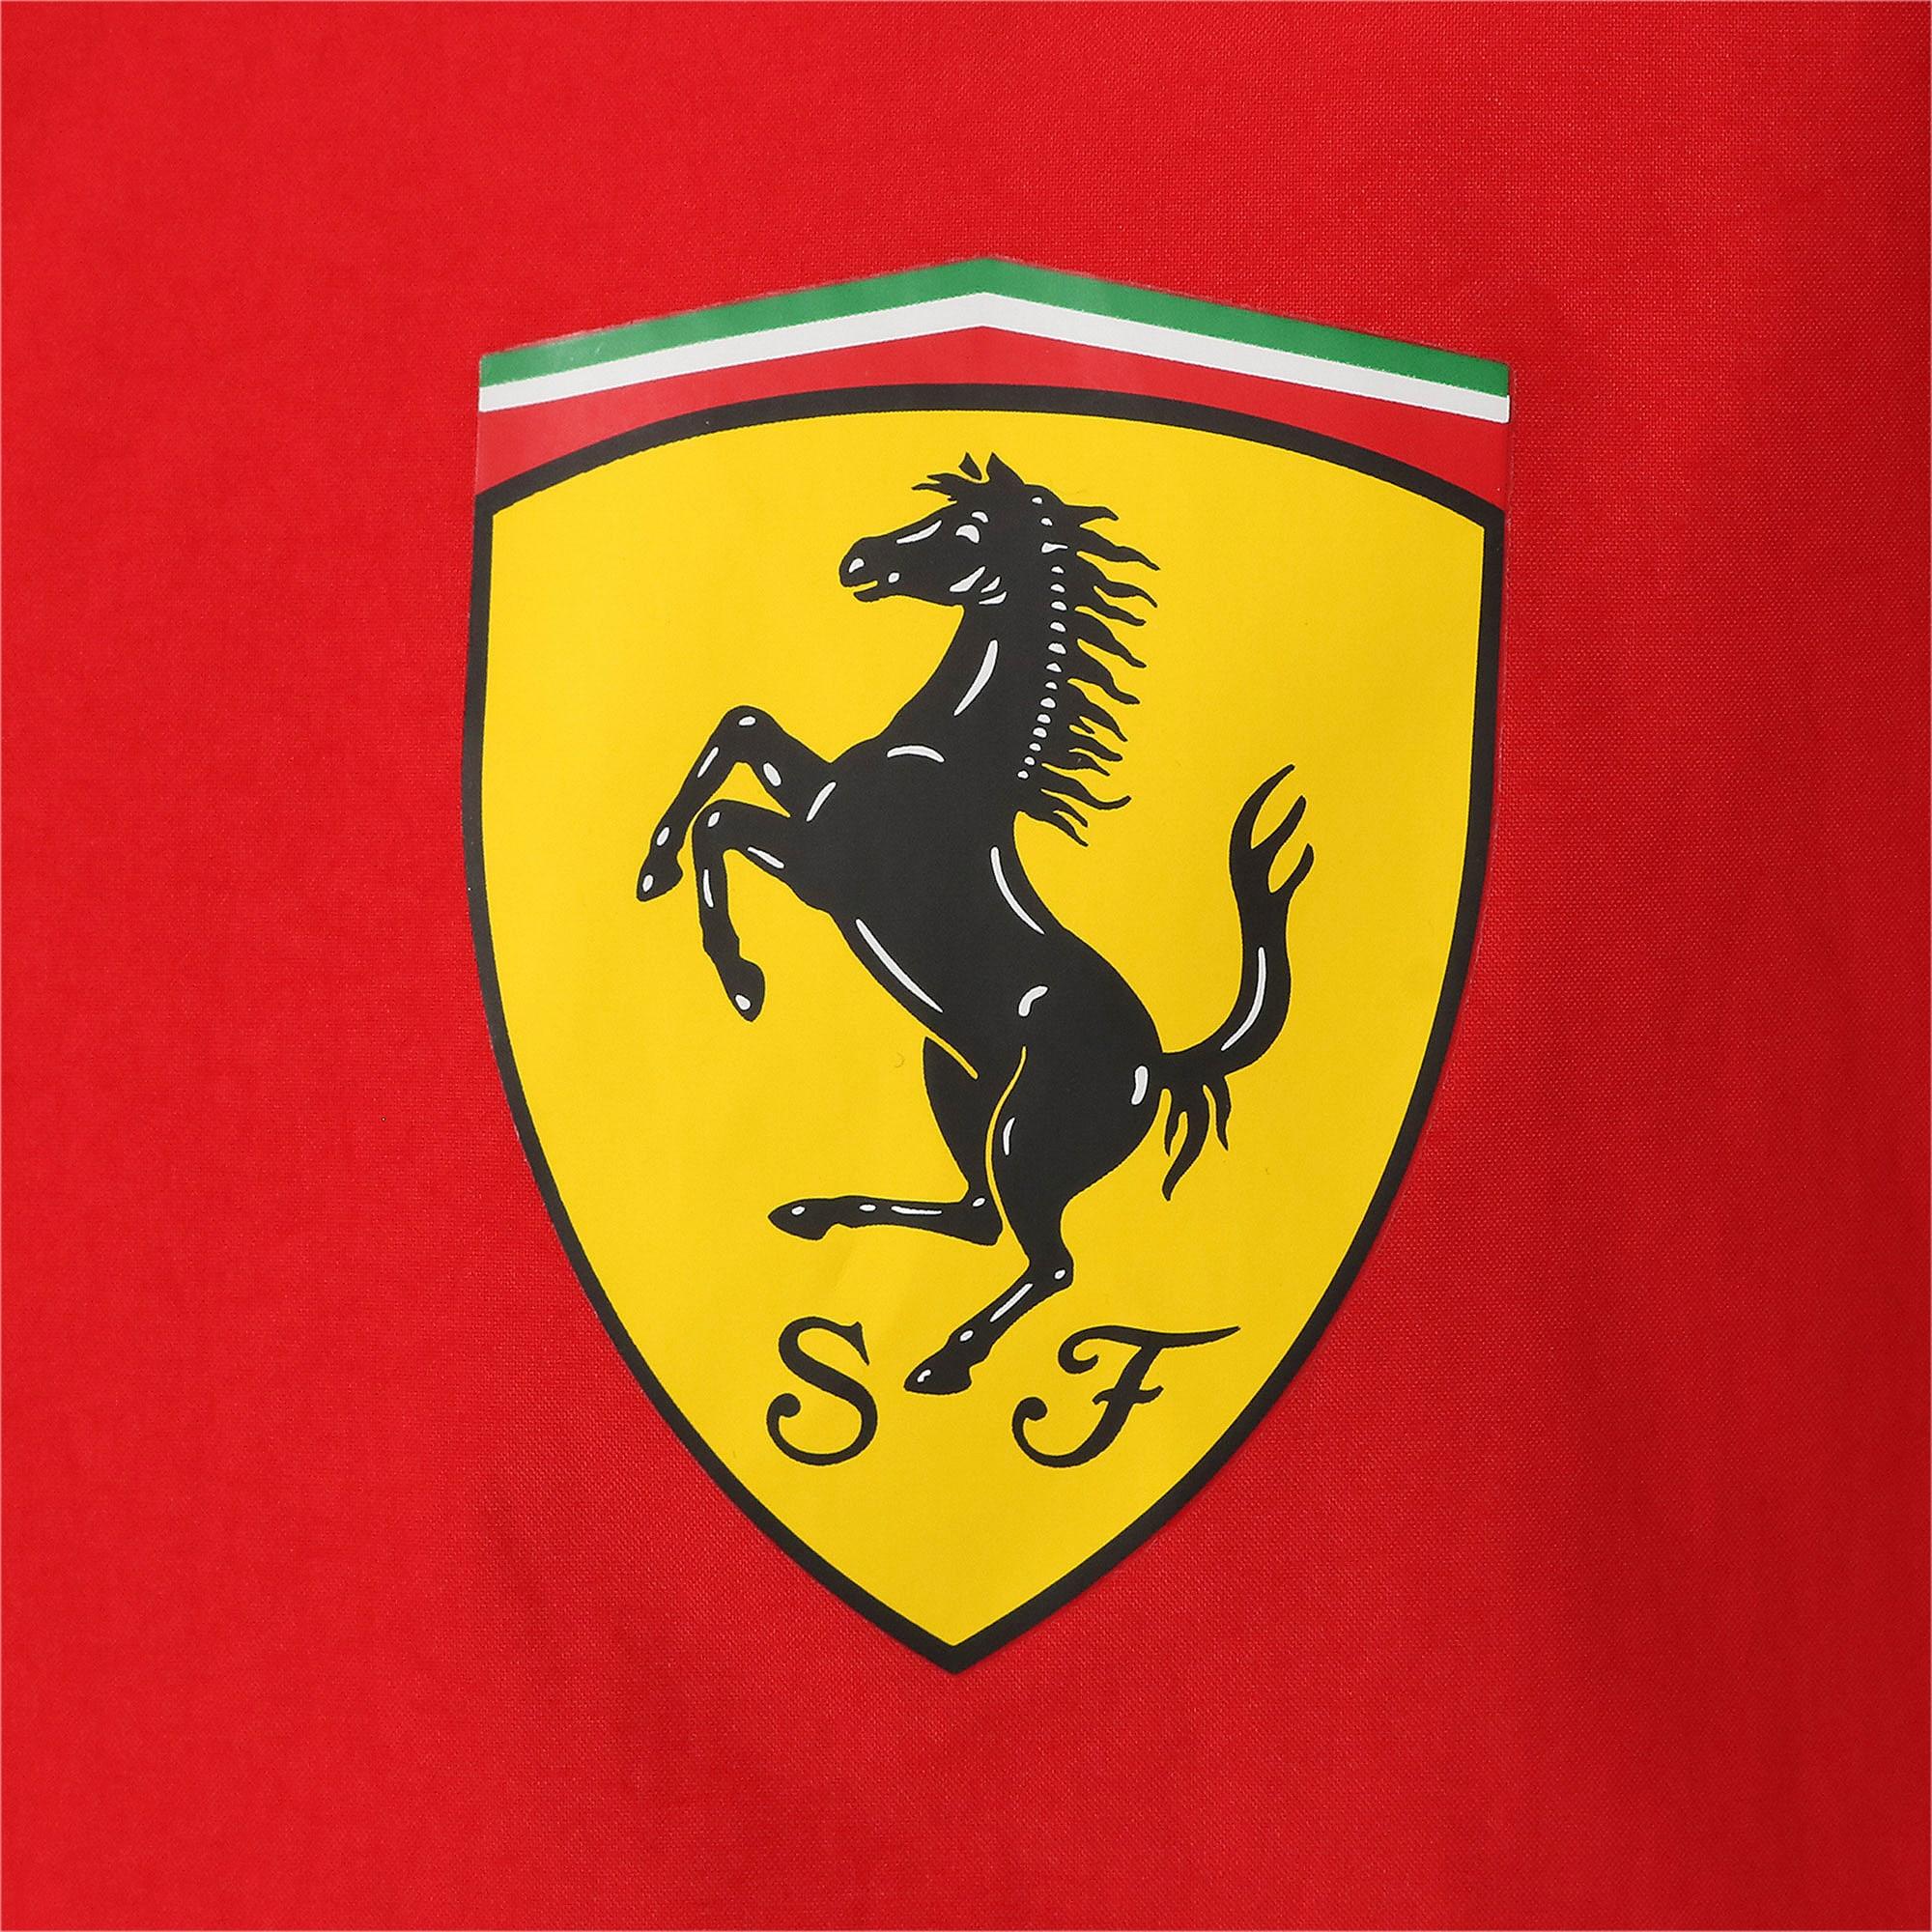 Thumbnail 8 of フェラーリ SF チーム ジャケット, Rosso Corsa-without MW Logo, medium-JPN